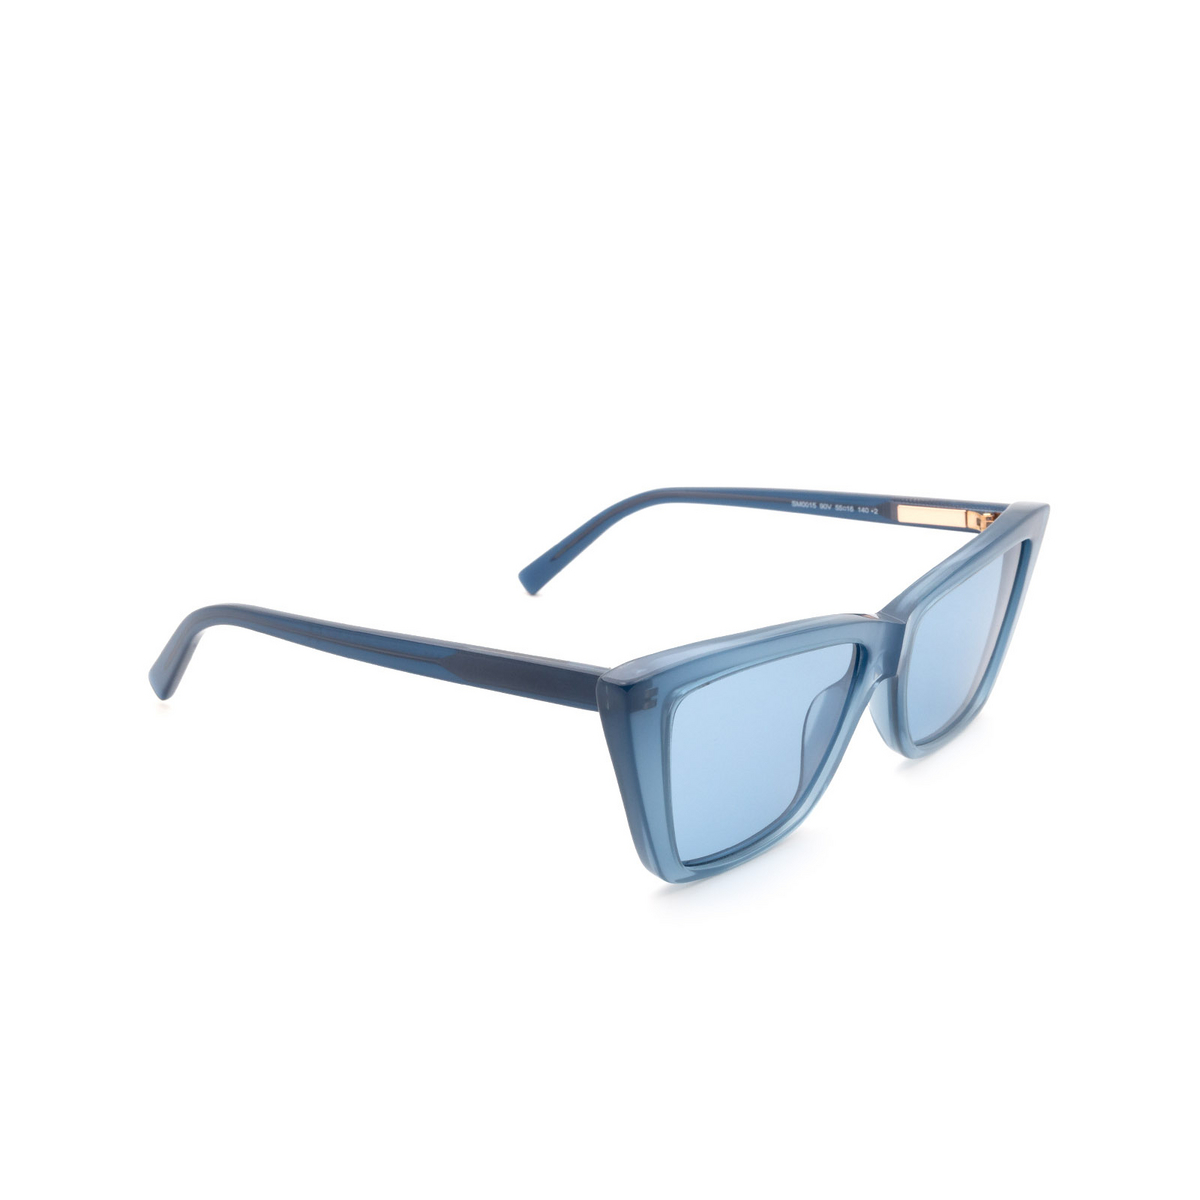 Sportmax® Butterfly Sunglasses: SM0015 color Shiny Blue 90V - three-quarters view.